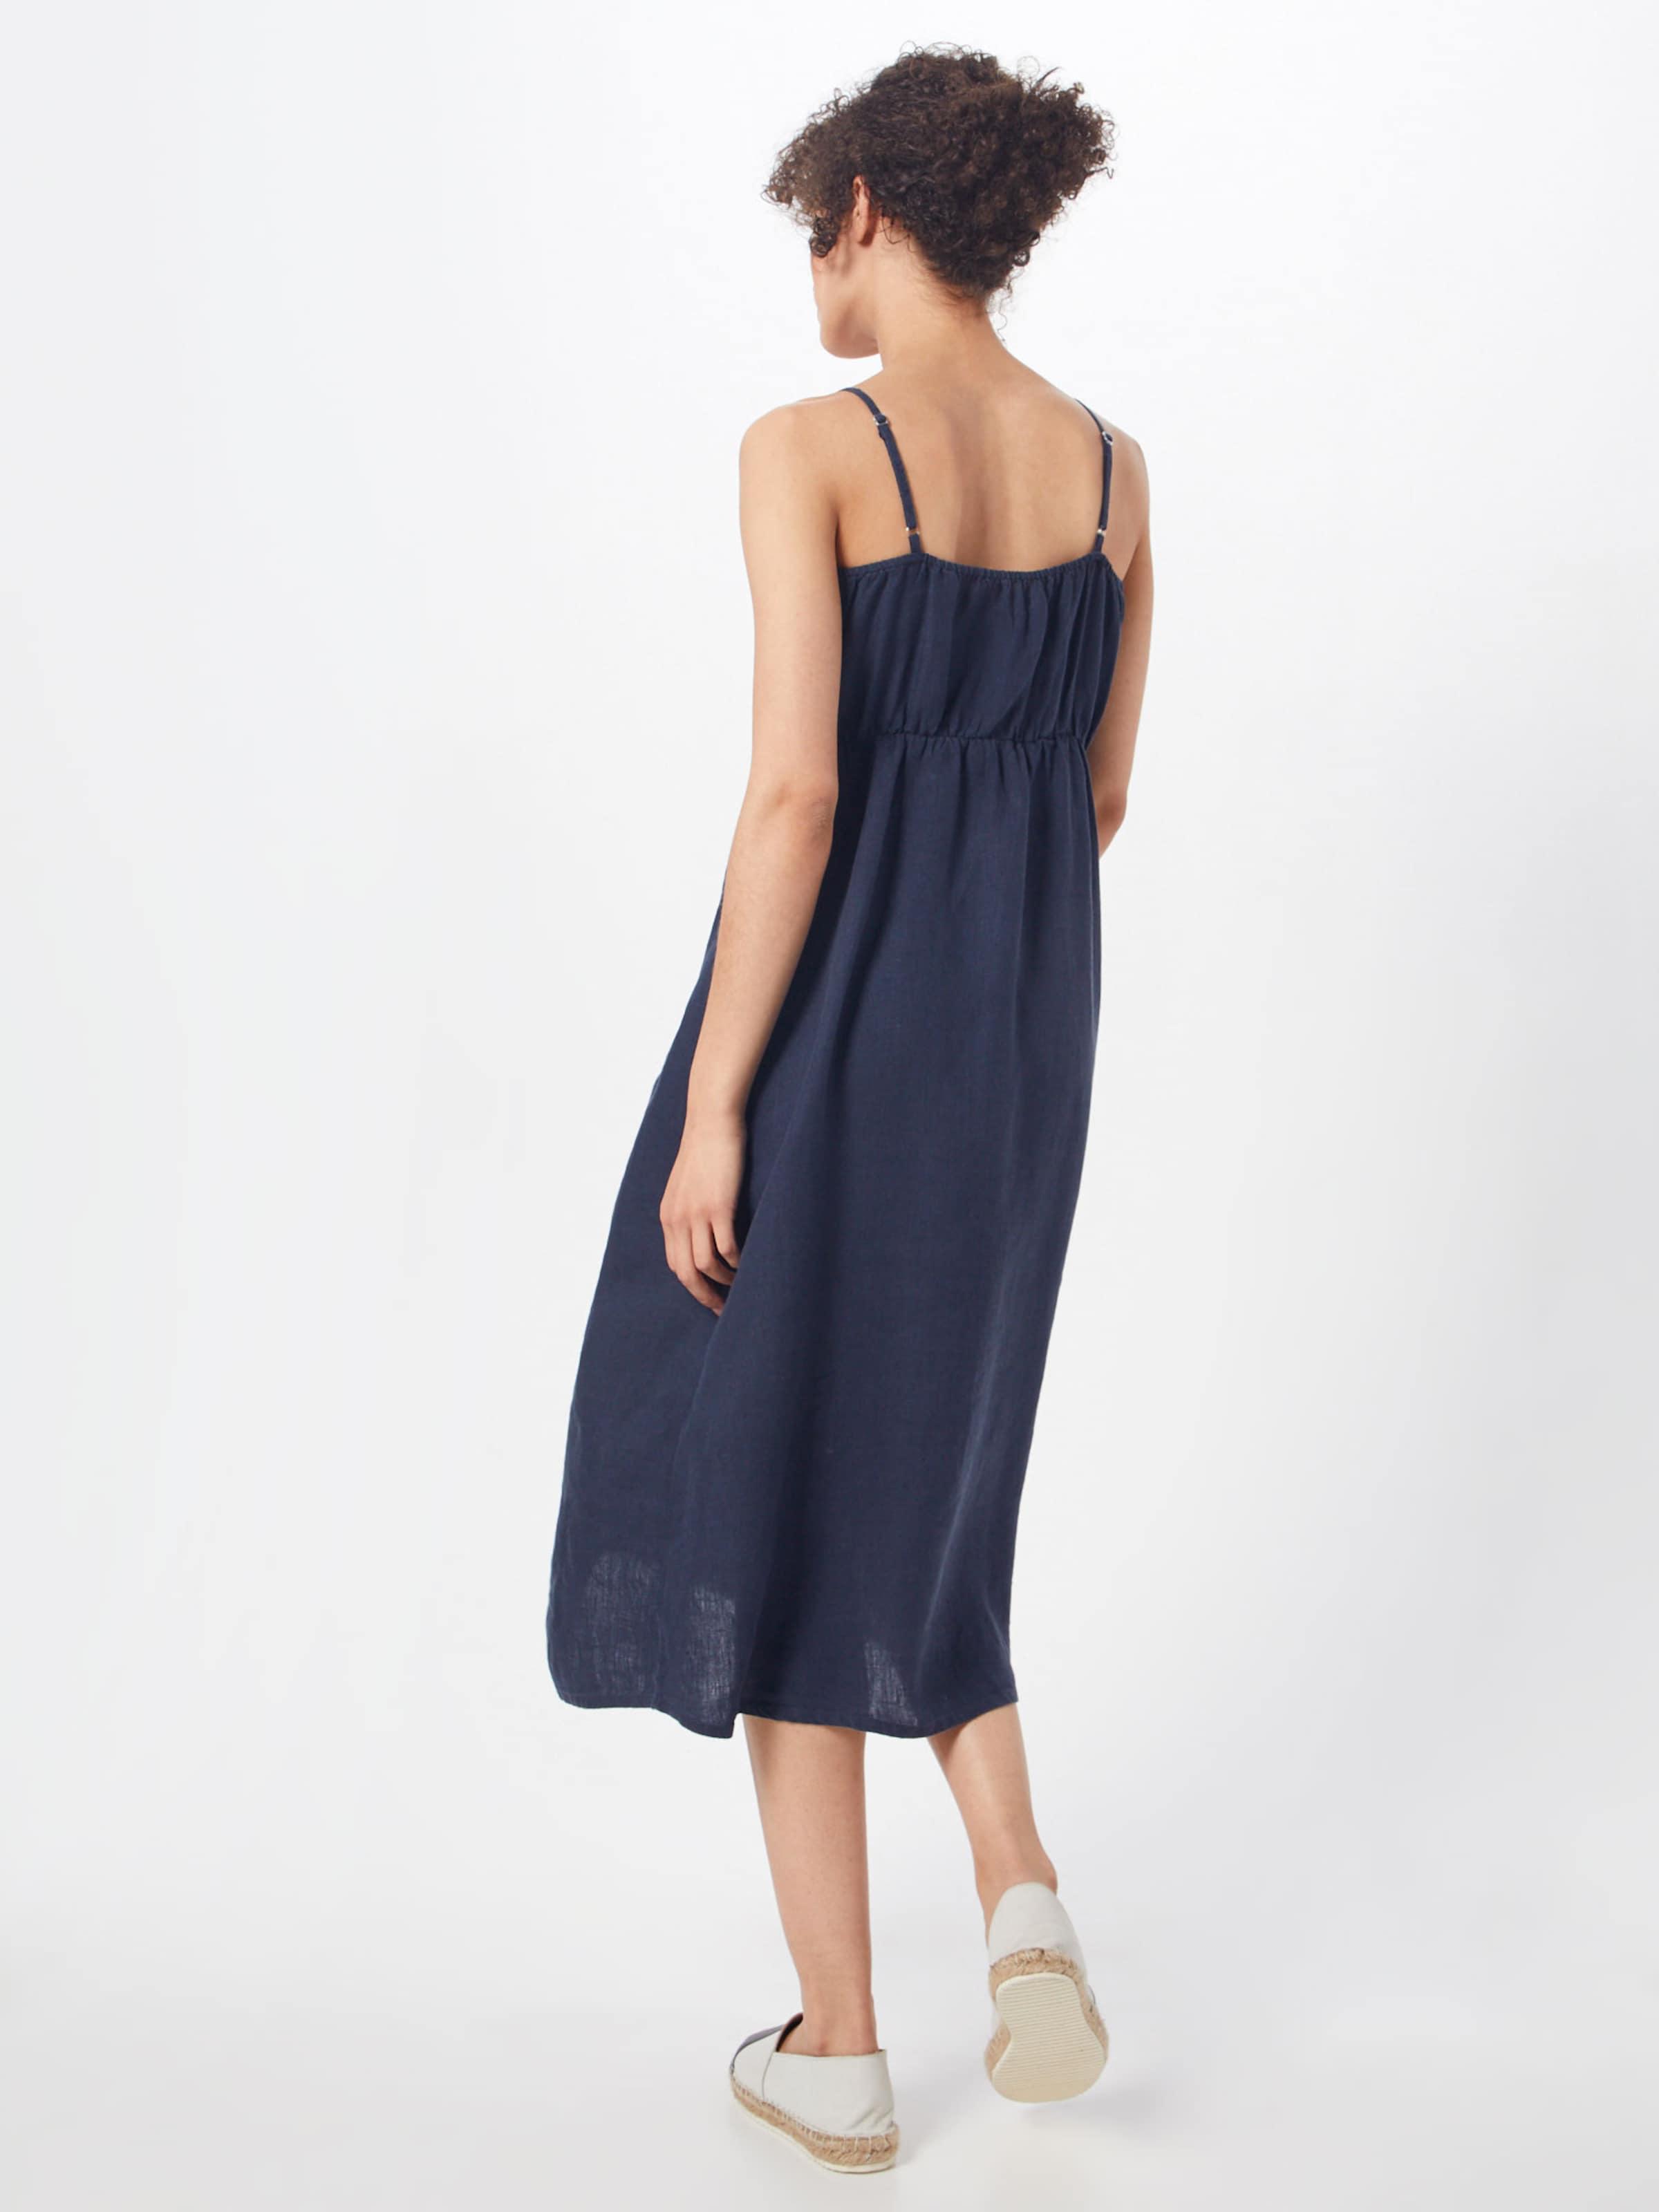 Nyc 'riko' Kleid Fashion In Broadway Dunkelblau WeDYE29IbH